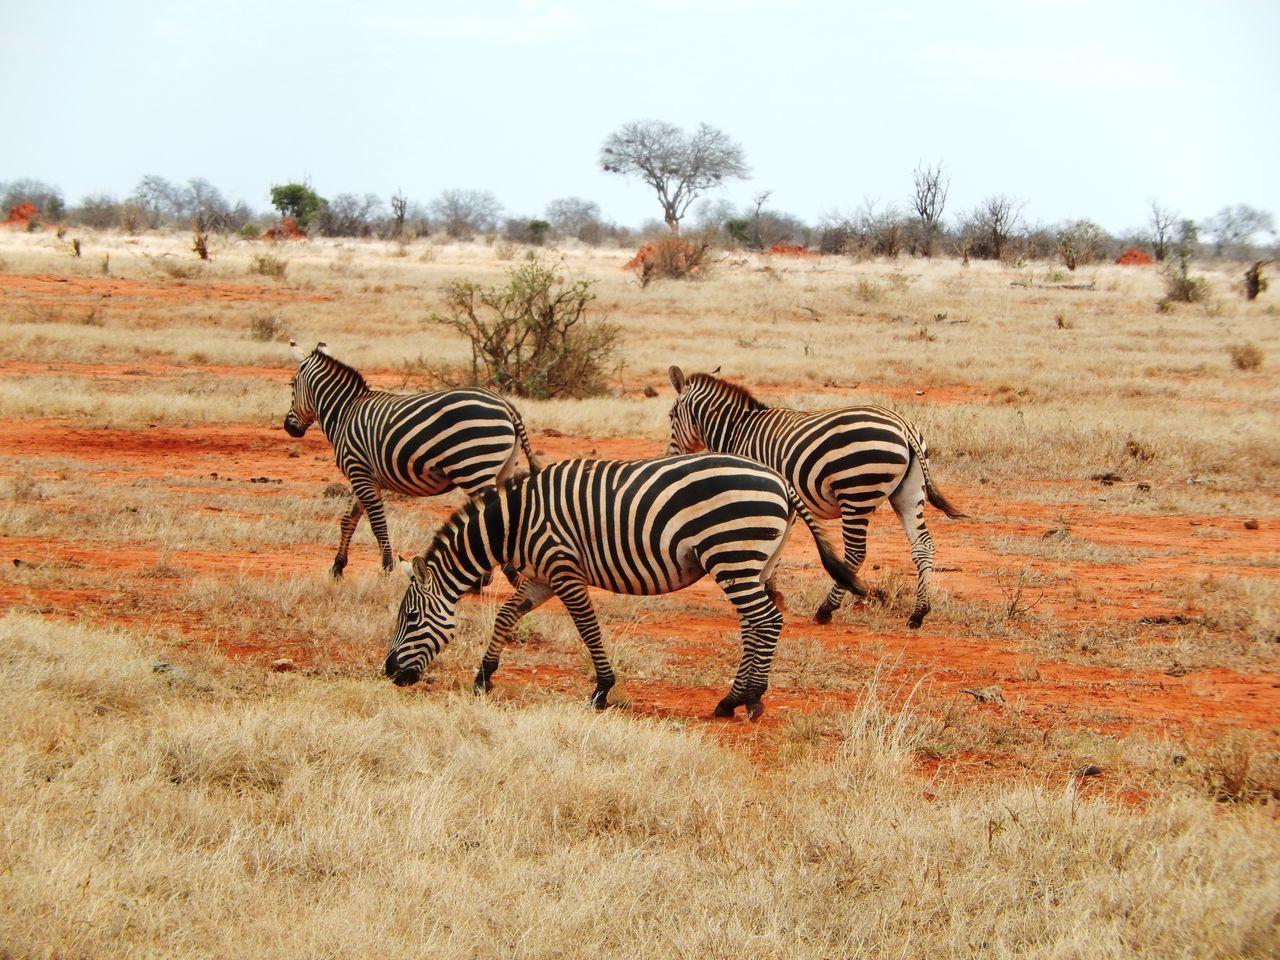 Africa Animal Themes Animals In The Wild Kenya Landscape Nationalpark Nature Safari Safari Animals Side View Striped Travel Travel Destinations Tsavo Wildlife Zebra